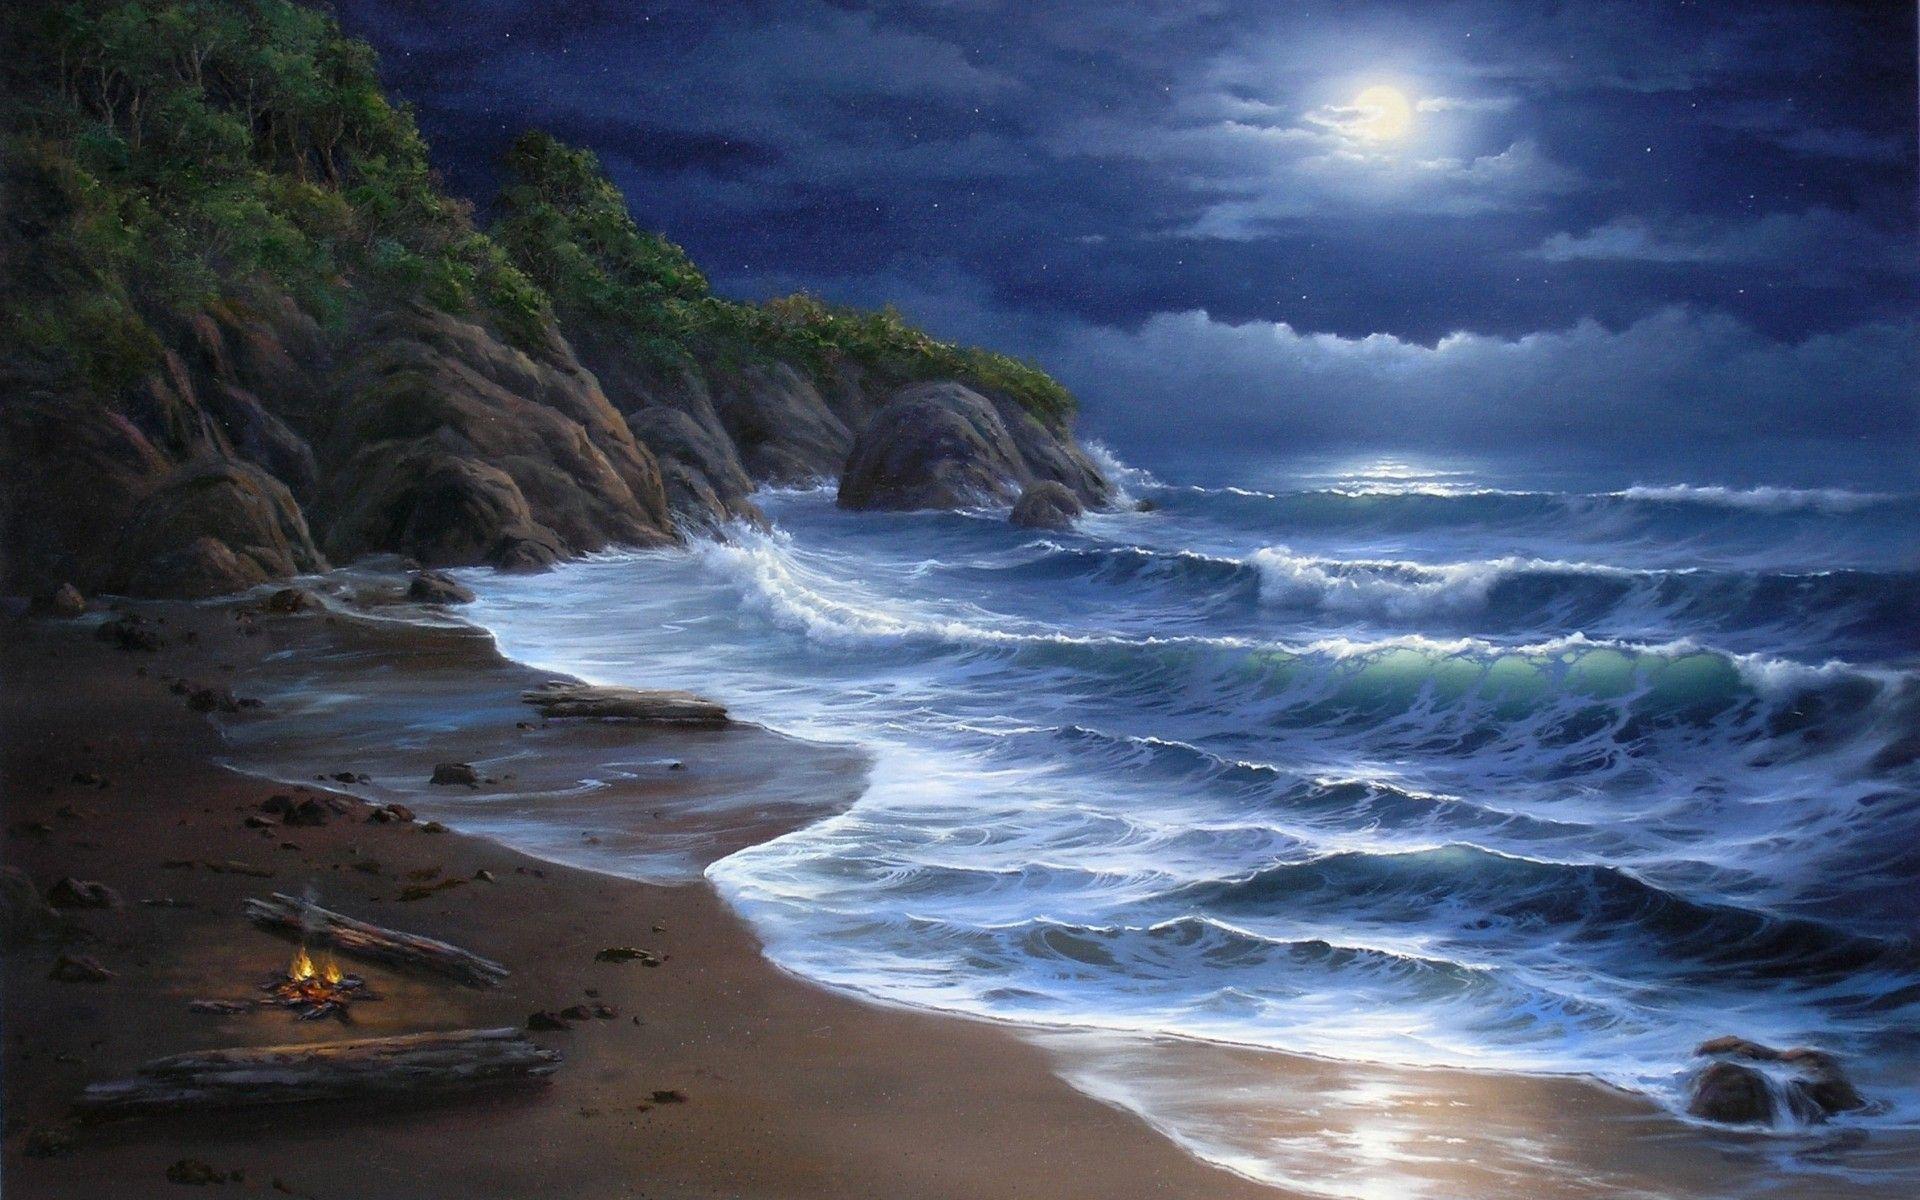 Nature Beaches Landscapes Waves Ocean Sea Seascape Cliff Trees Tropical Sky Clouds Moon Moonlight Art Artistic Painti Beach Landscape Nature Wallpaper Seascape